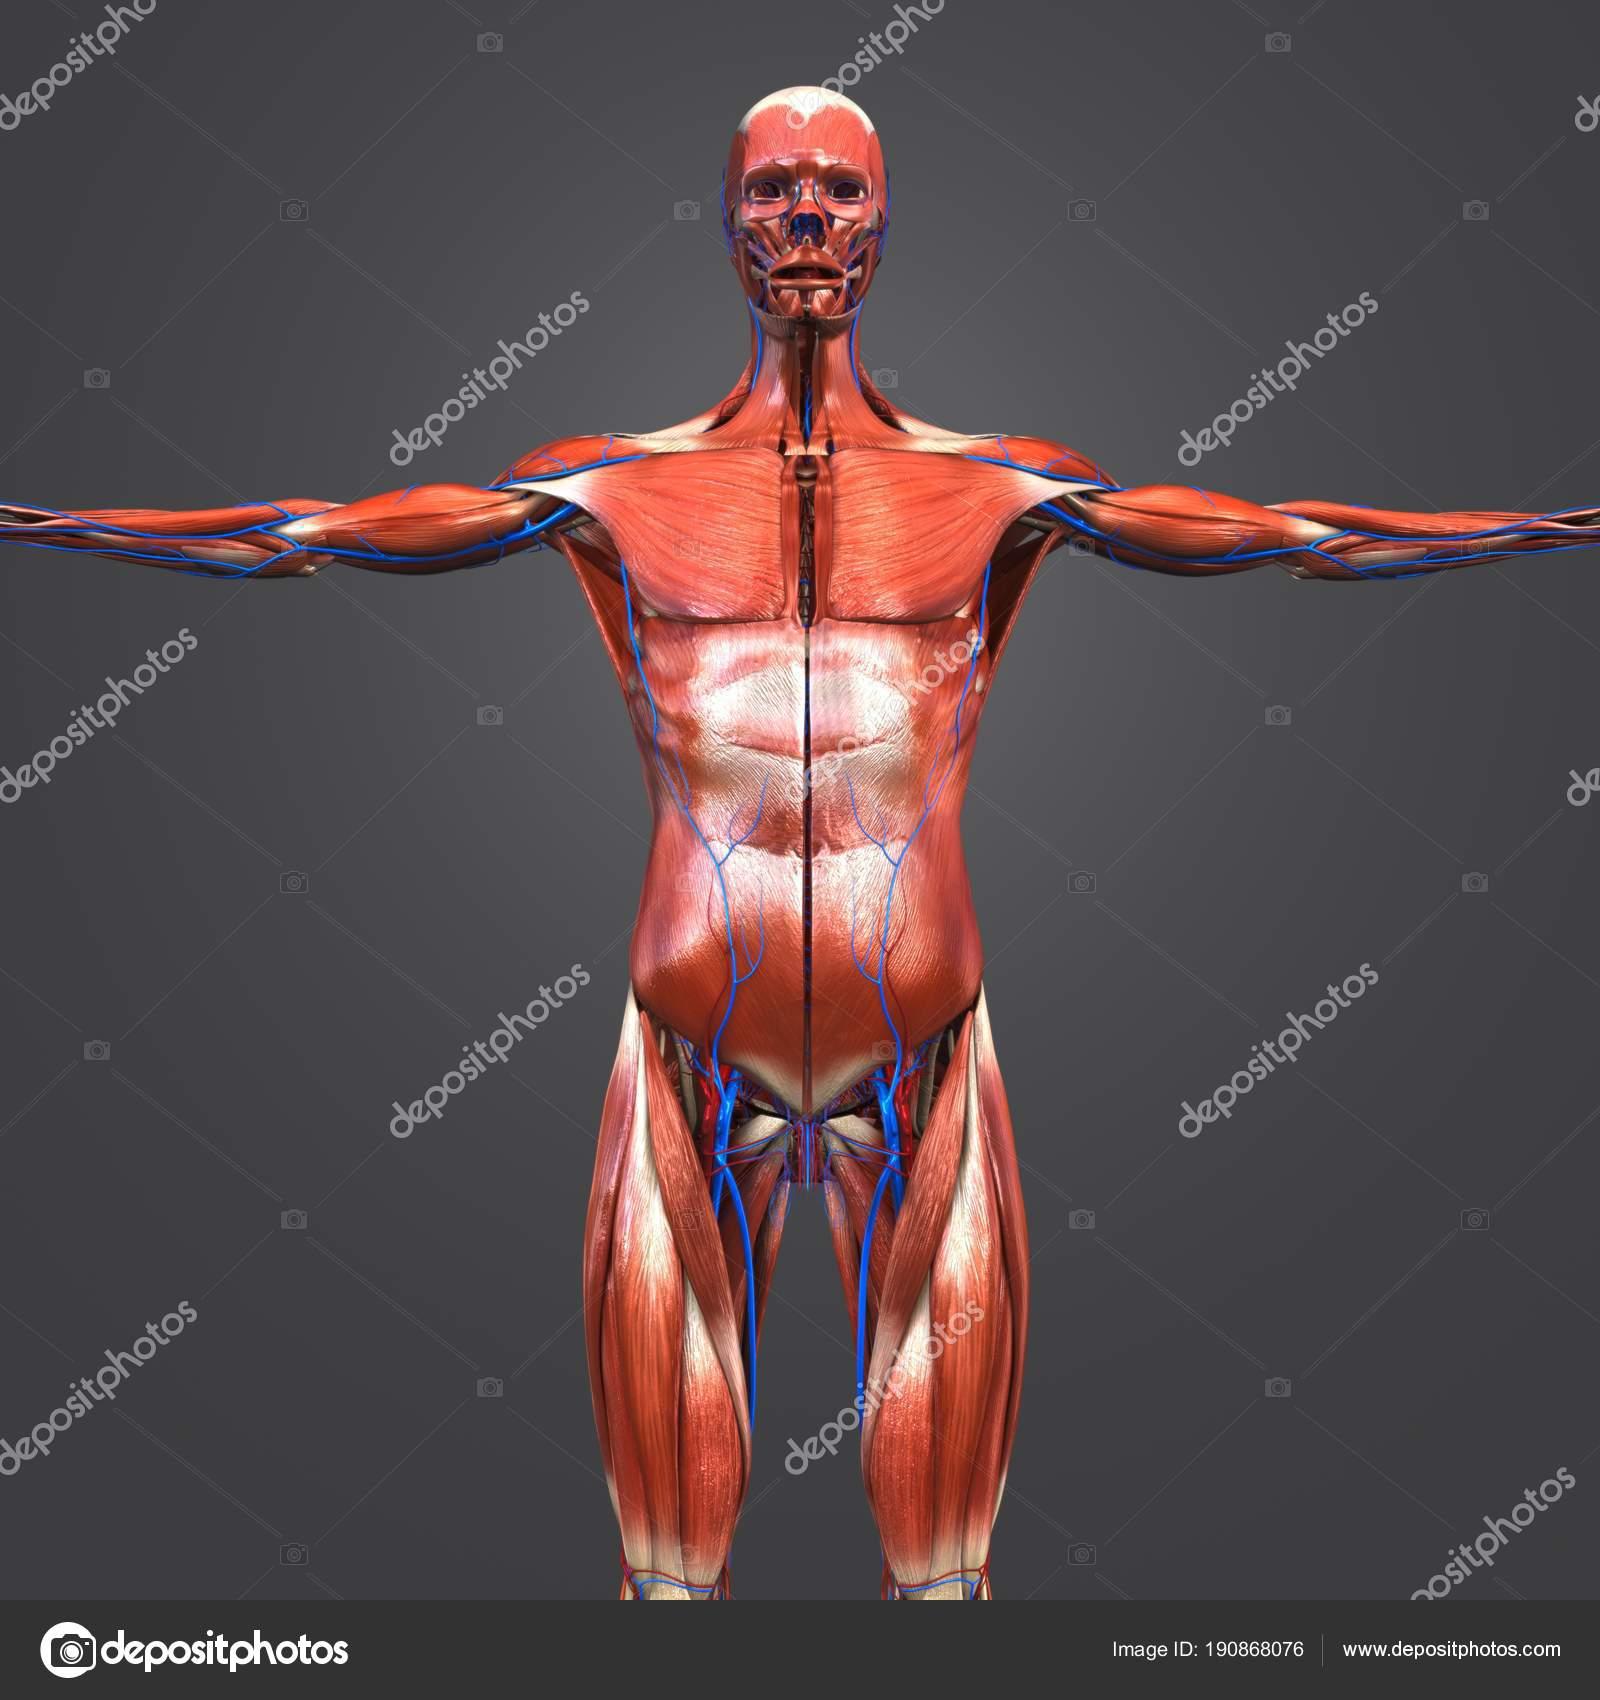 Colorful Medical Illustration Human Muscular Anatomy Circulatory